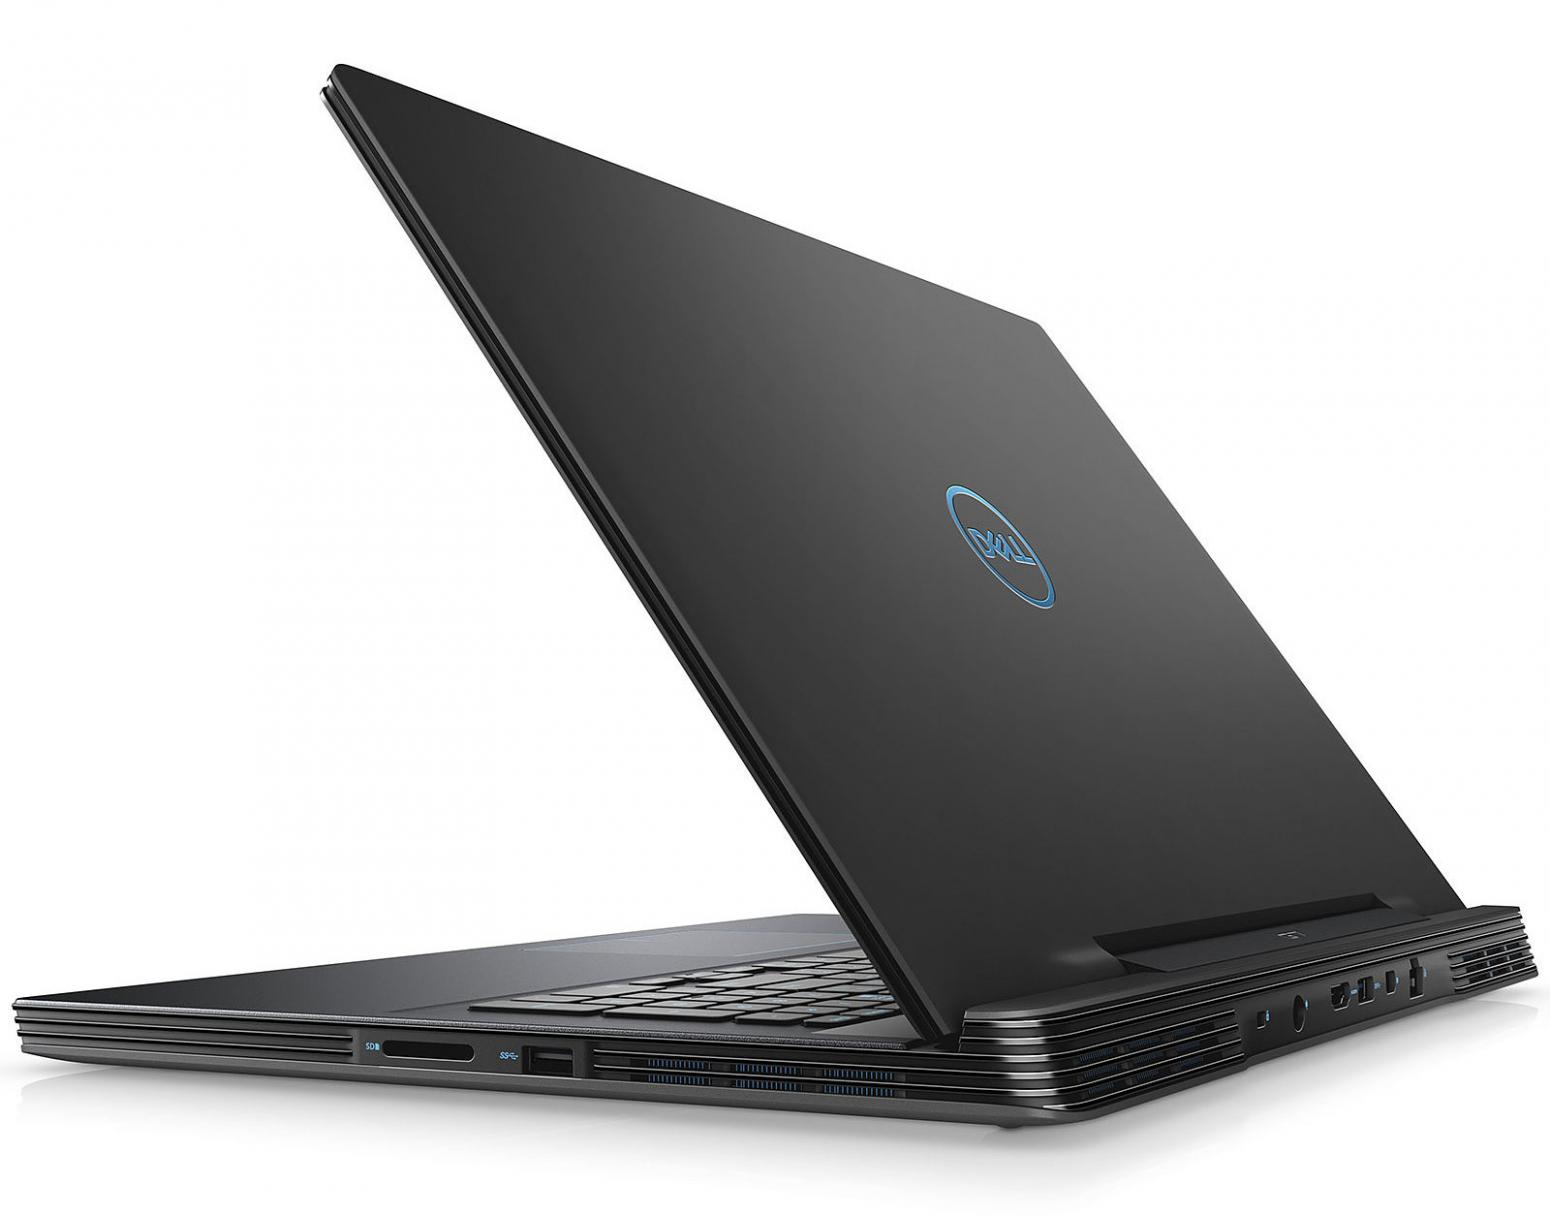 Ordinateur portable Dell G7 17 7790 (29D8X) Noir - RTX 2060, Hexa Core i7 - photo 5